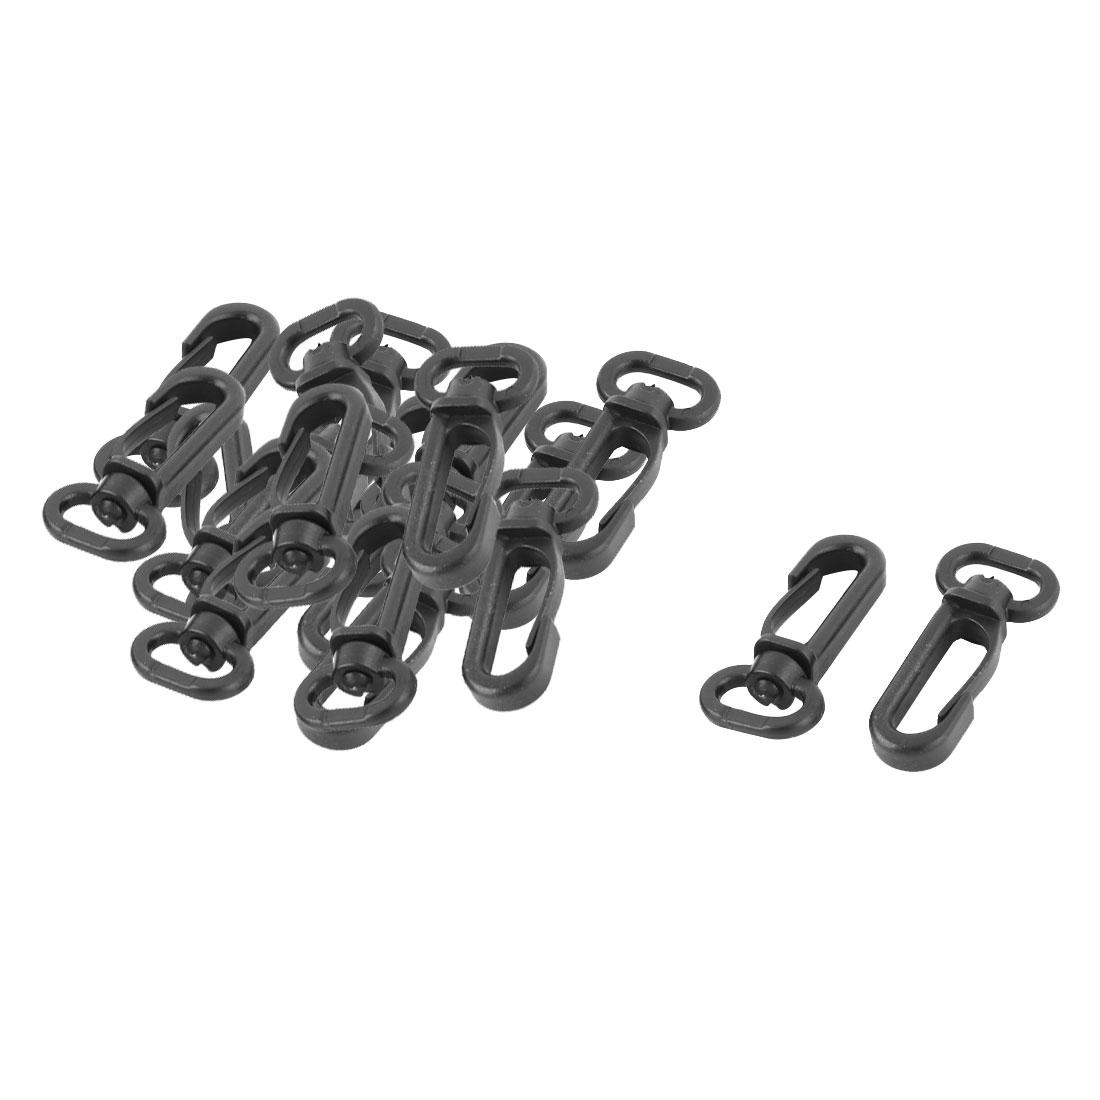 Bag Accessory Plastic Belting Trigger Clips Swivel Snap Hook Buckle Black 20pcs